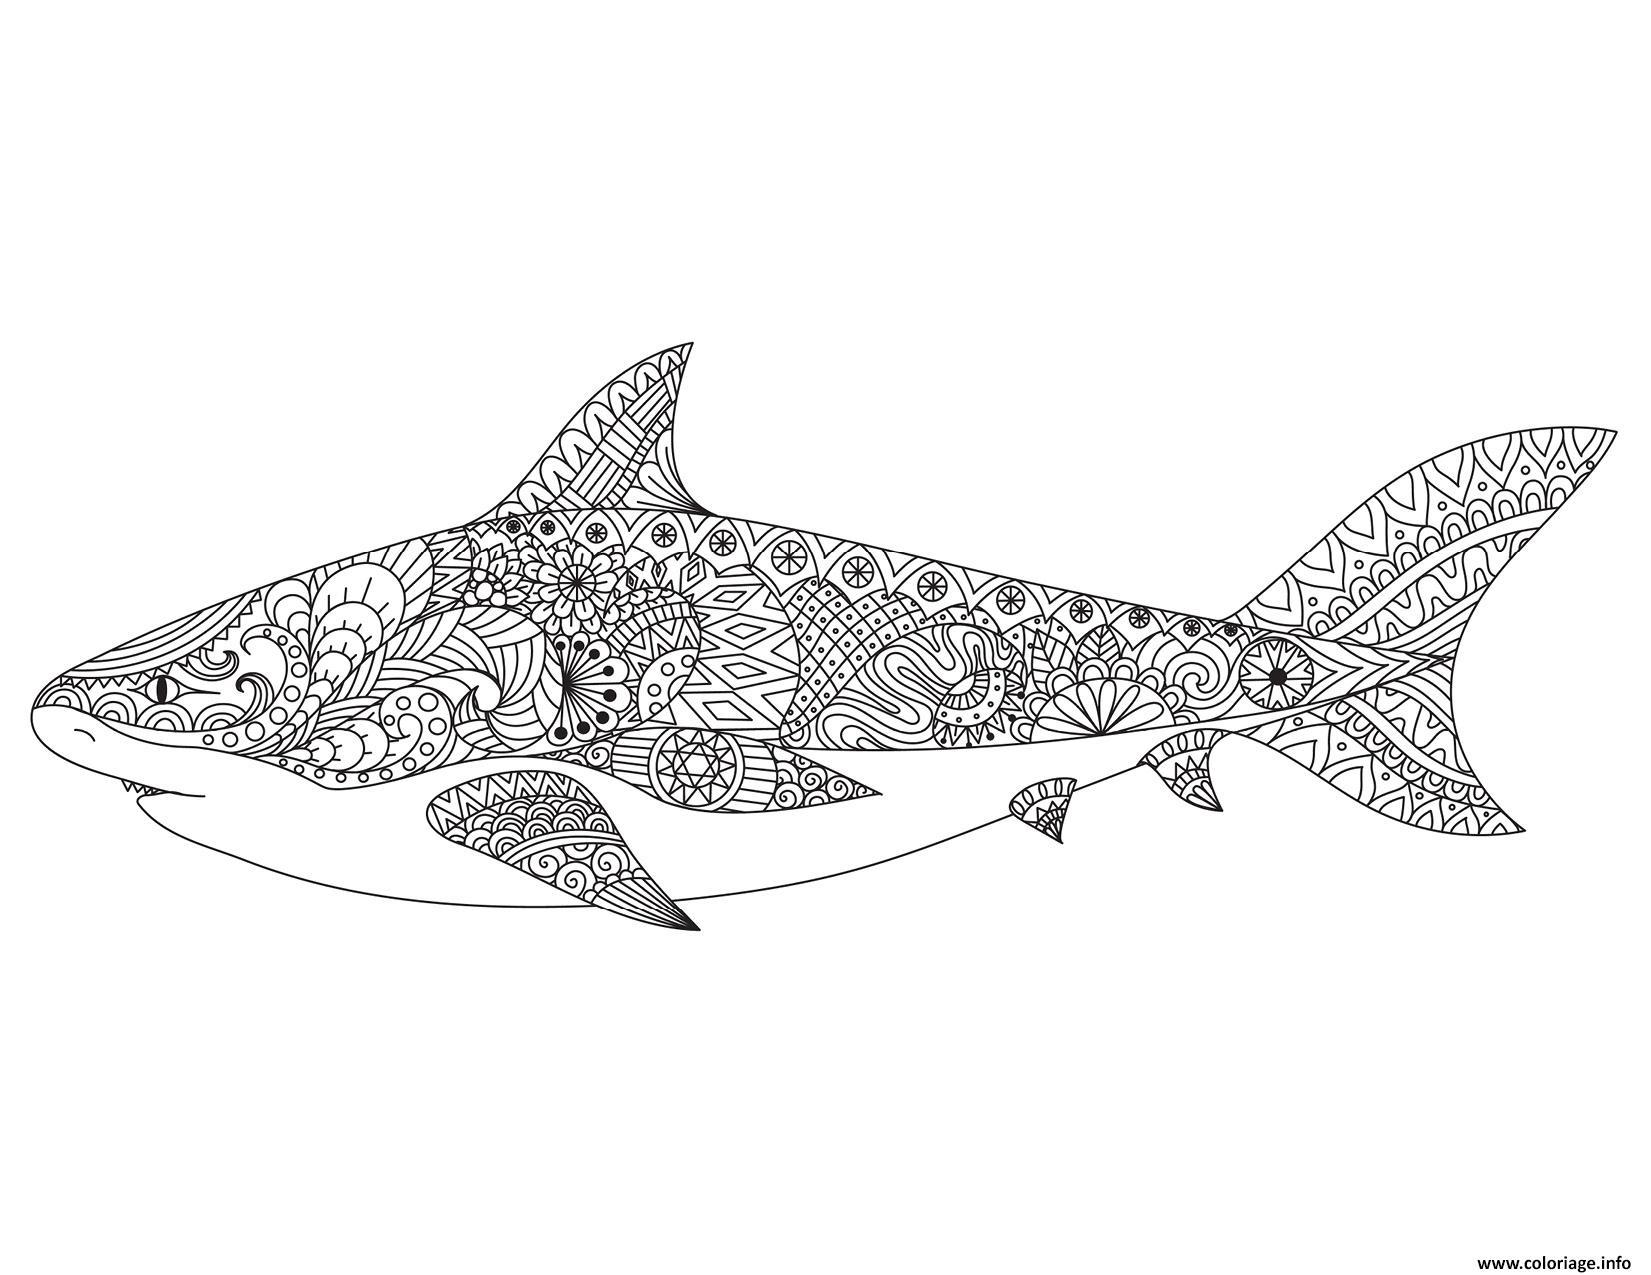 Dessin requin mandala par bimbimkha Coloriage Gratuit à Imprimer